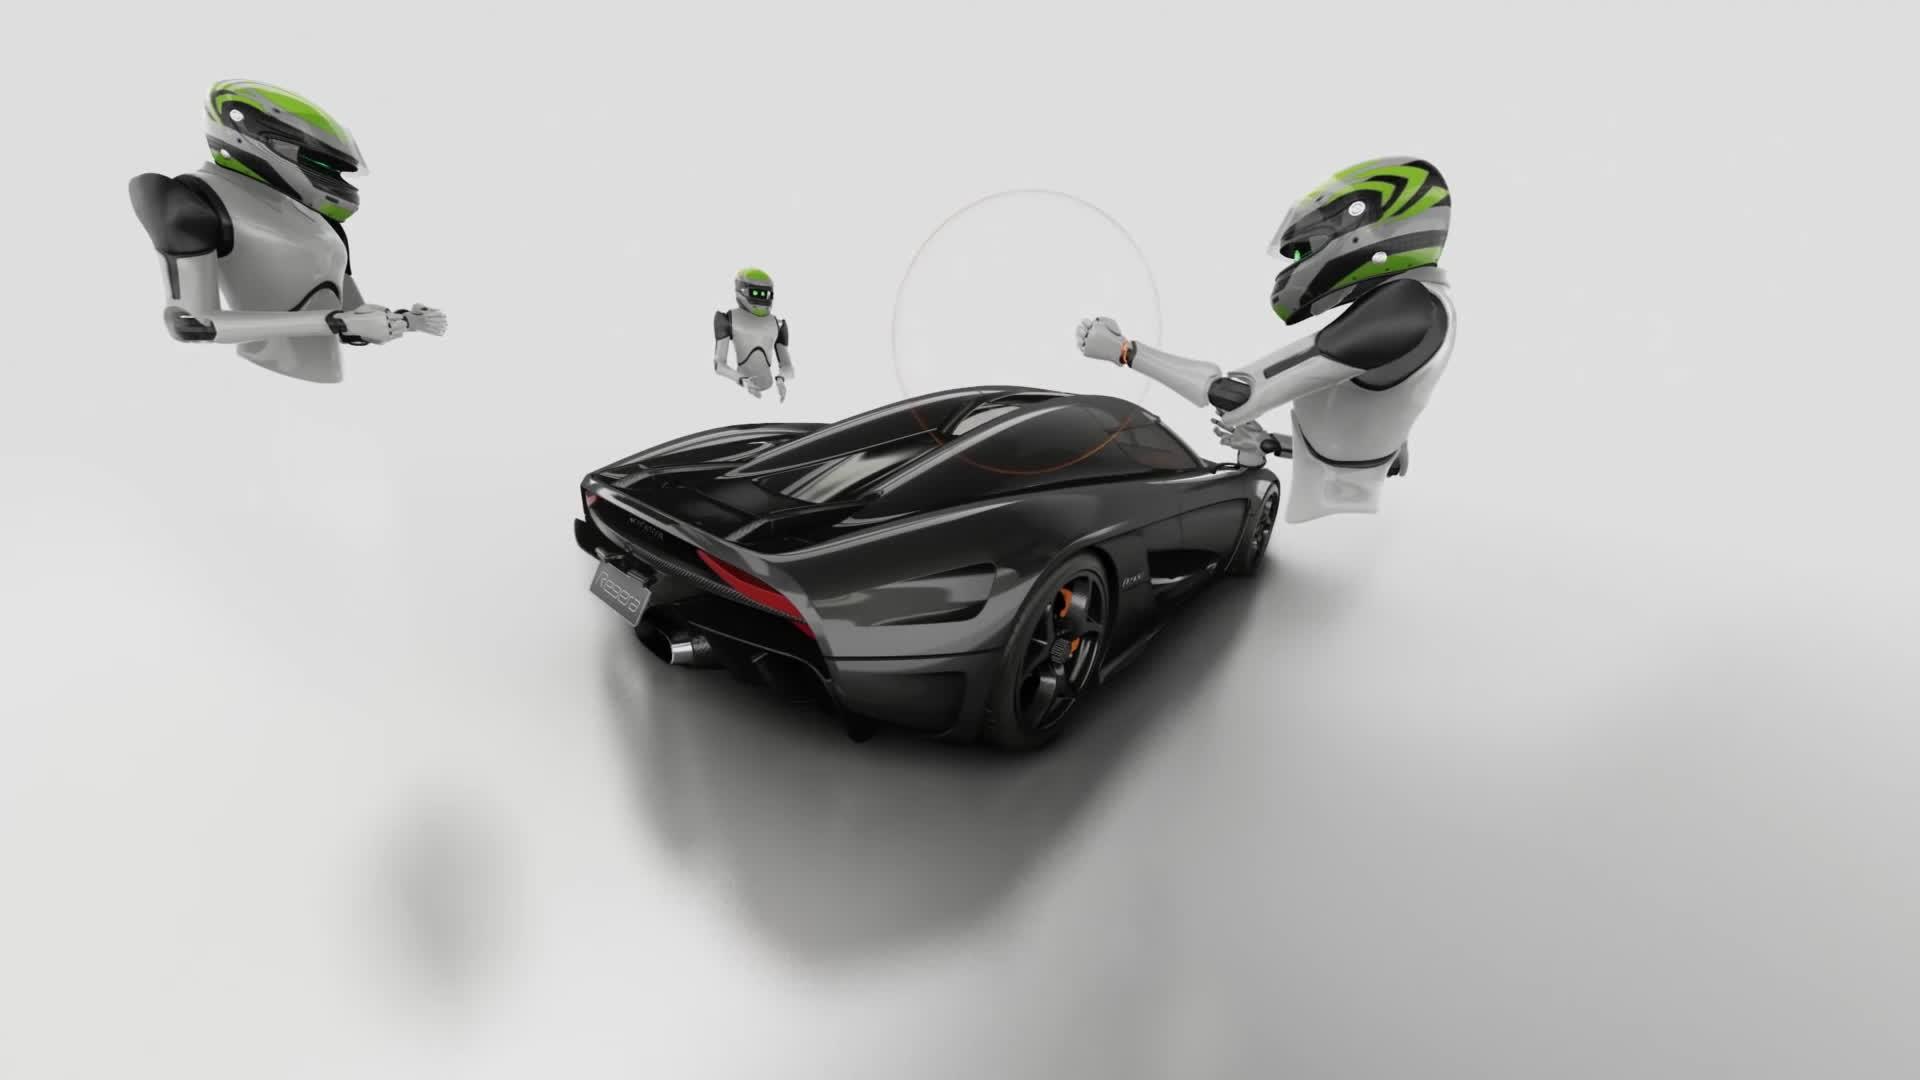 nvidia, project holodeck, virtual reality, NVIDIA Announces Project Holodeck GIFs